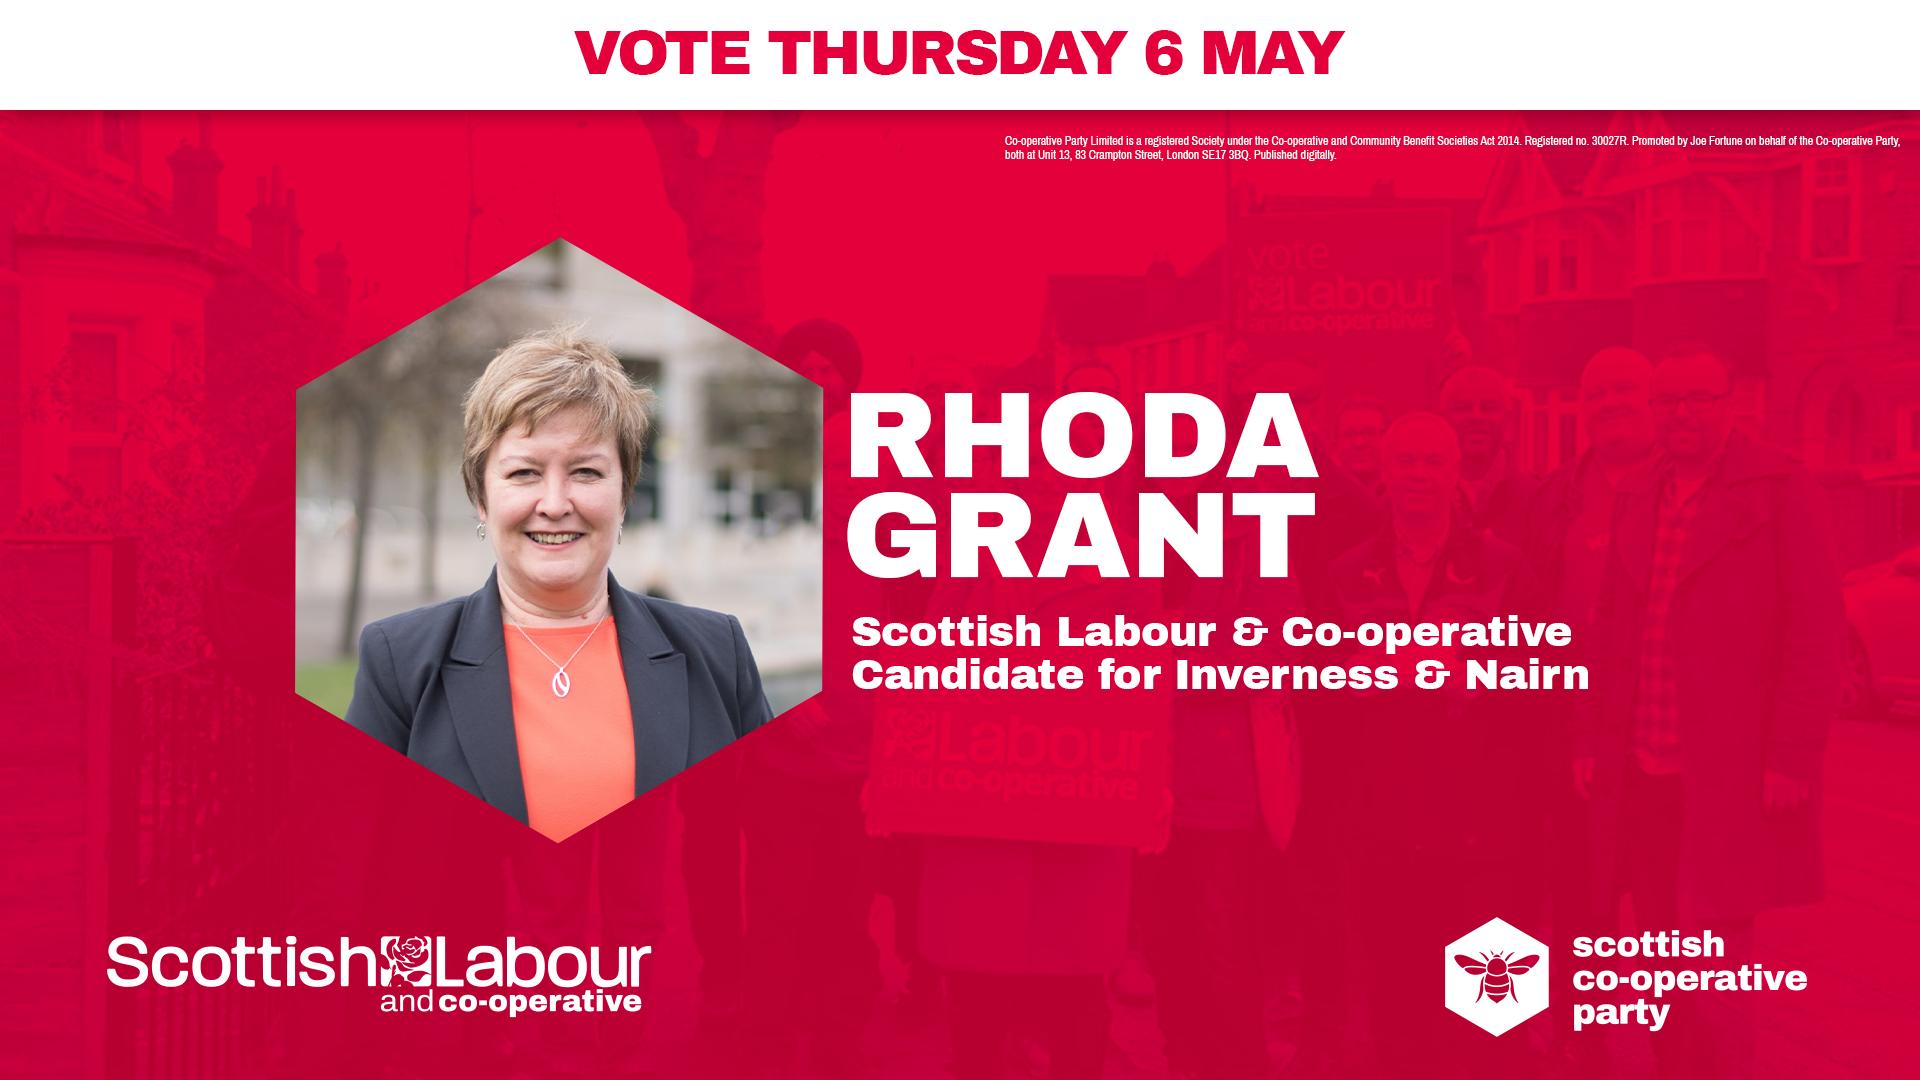 Rhoda Grant